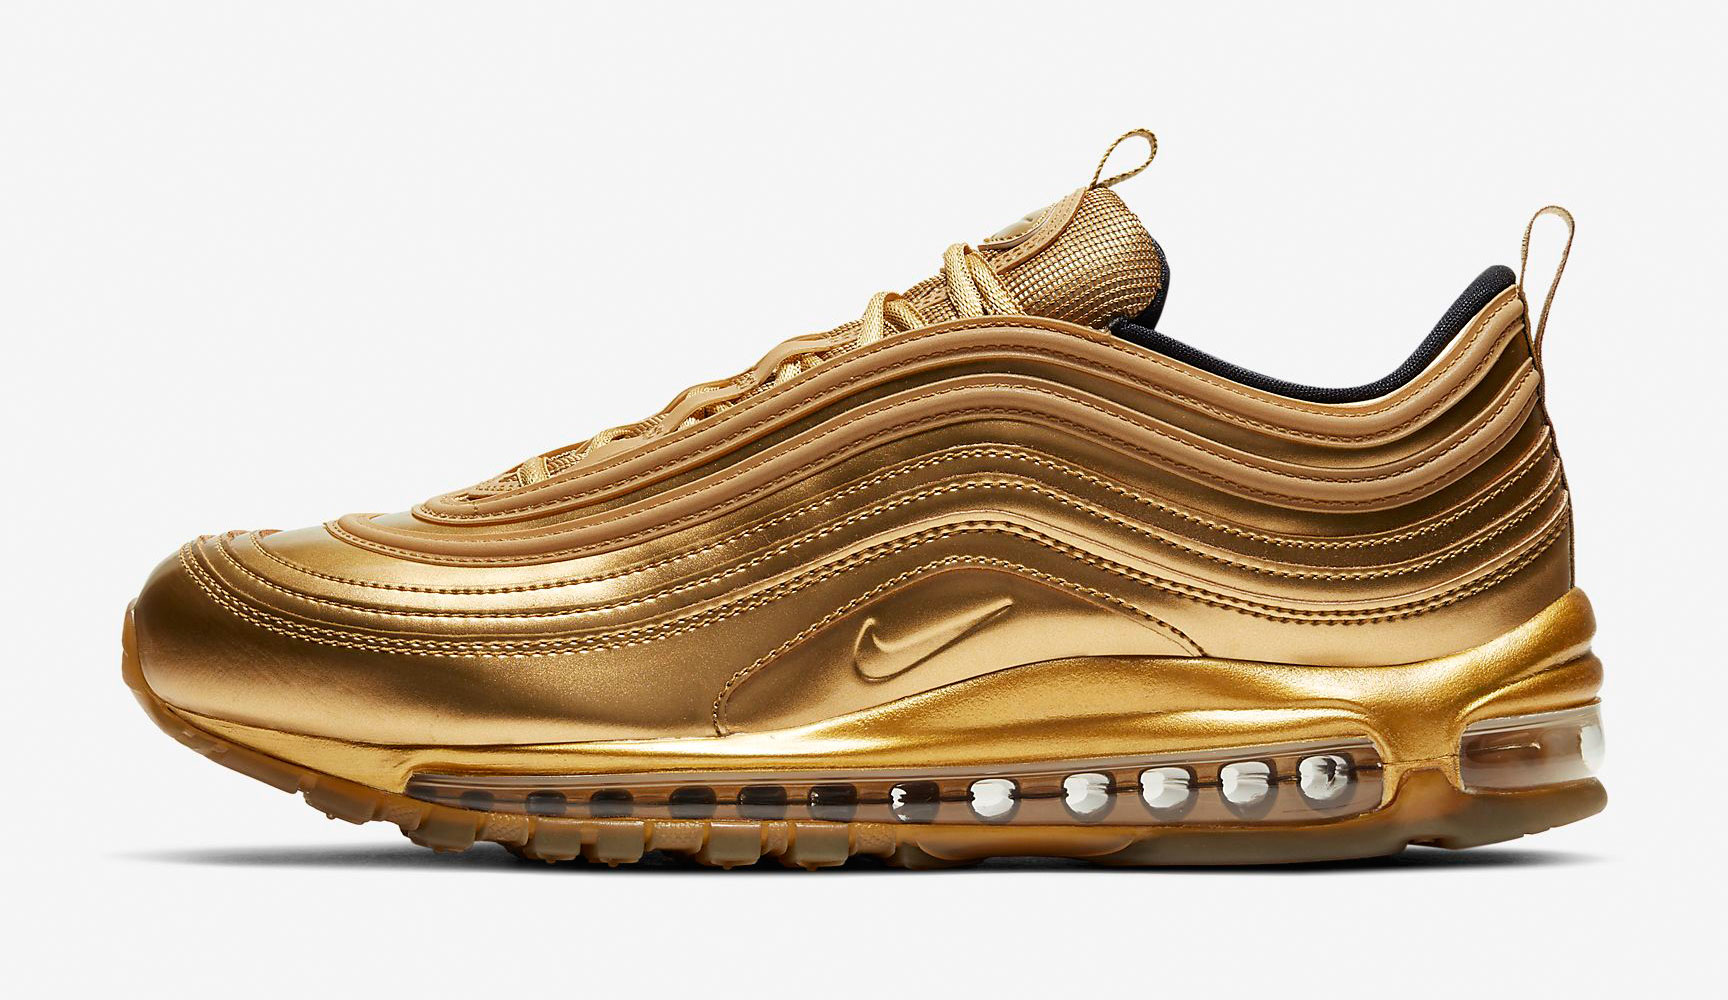 nike-air-max-97-metallic-gold-release-date